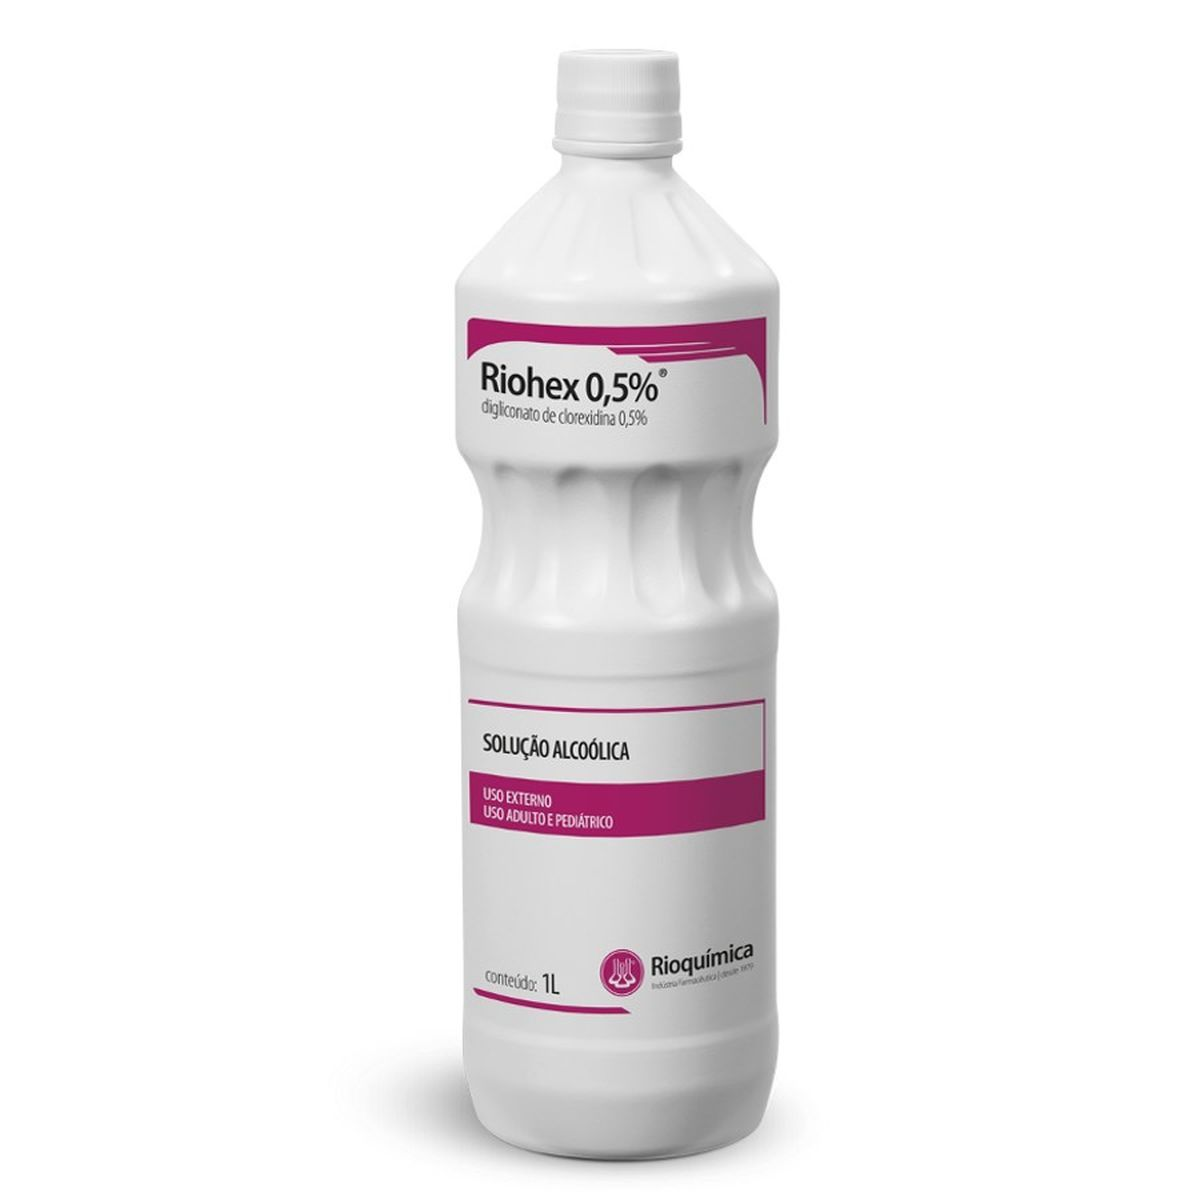 Digliconato de clorexidina 0,5% Riohex   1L - RIOQUÍMICA